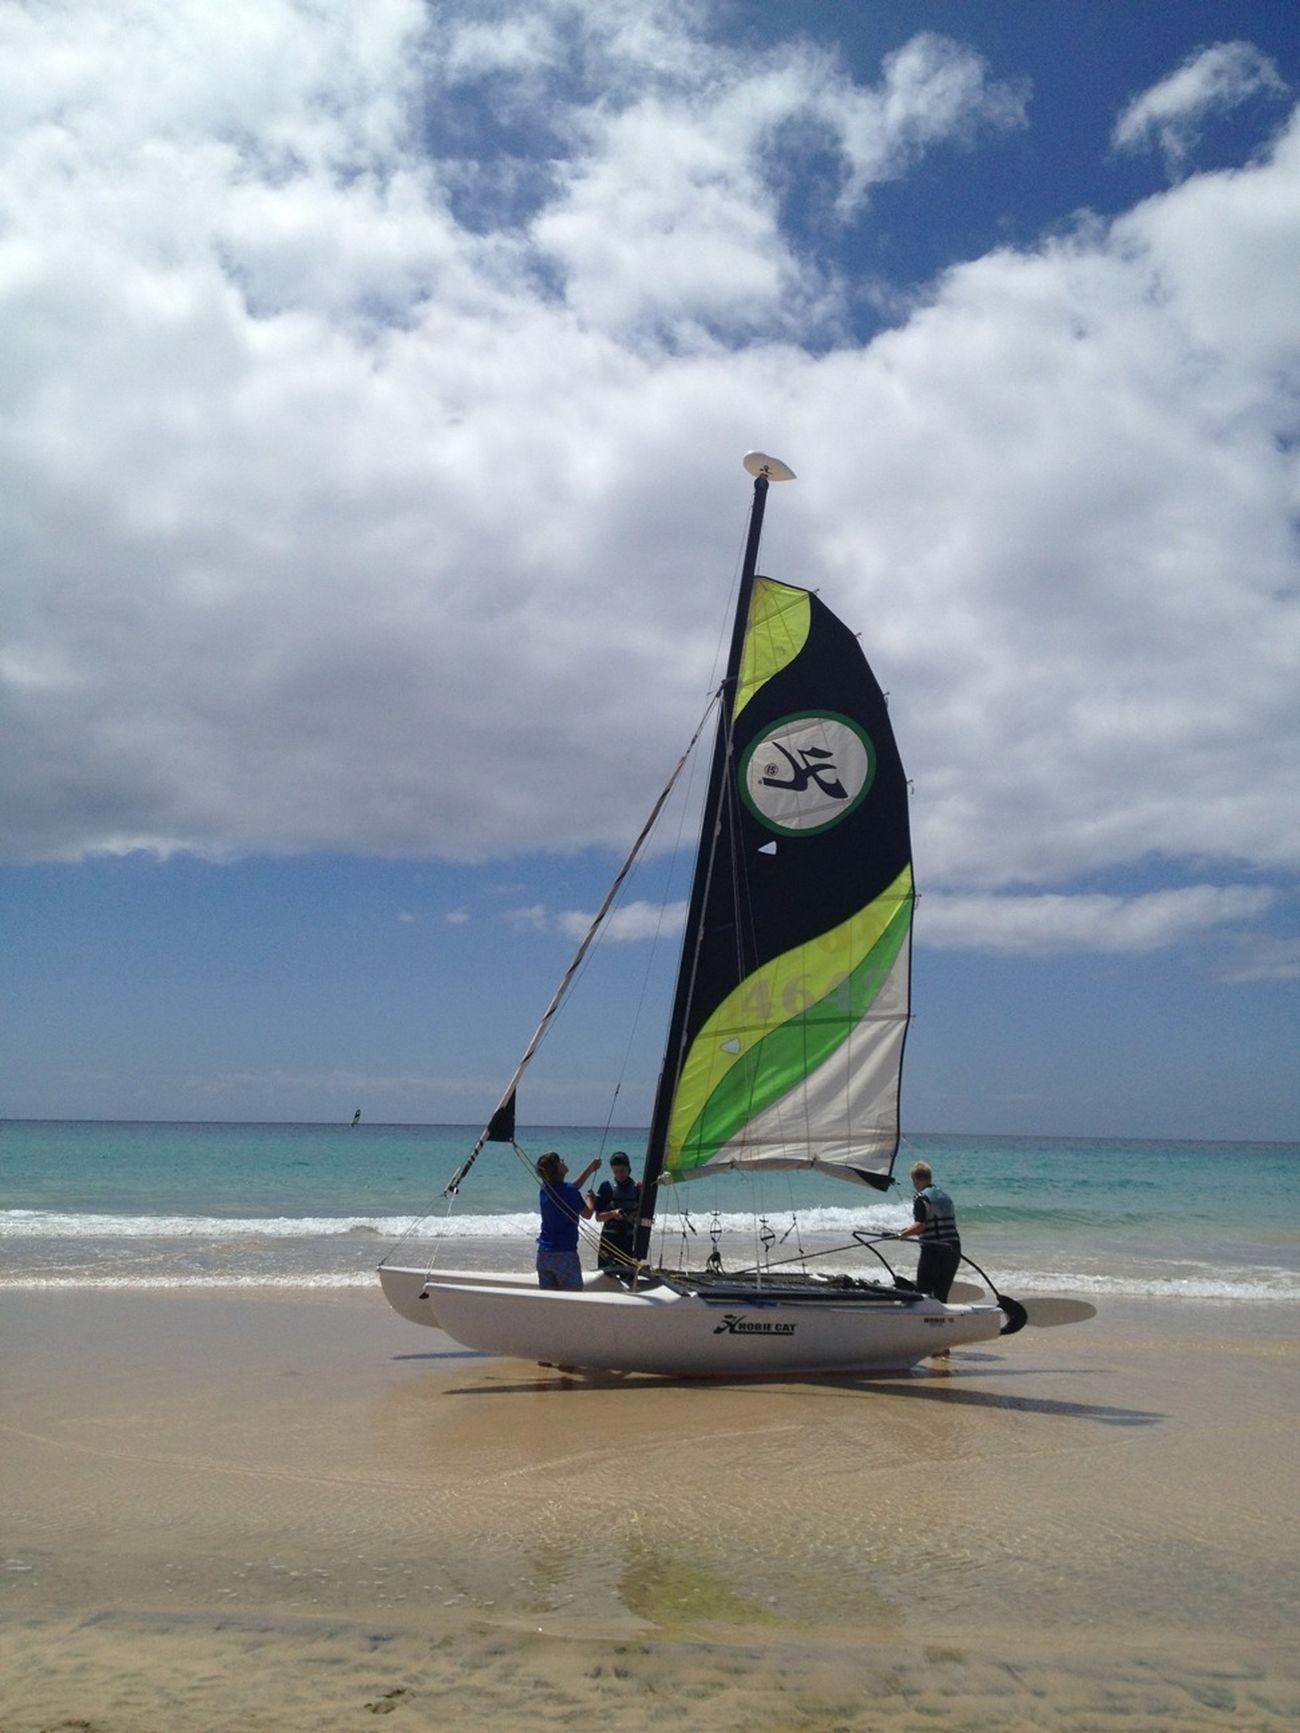 Enjoying The Sun Catamaran From The Sea